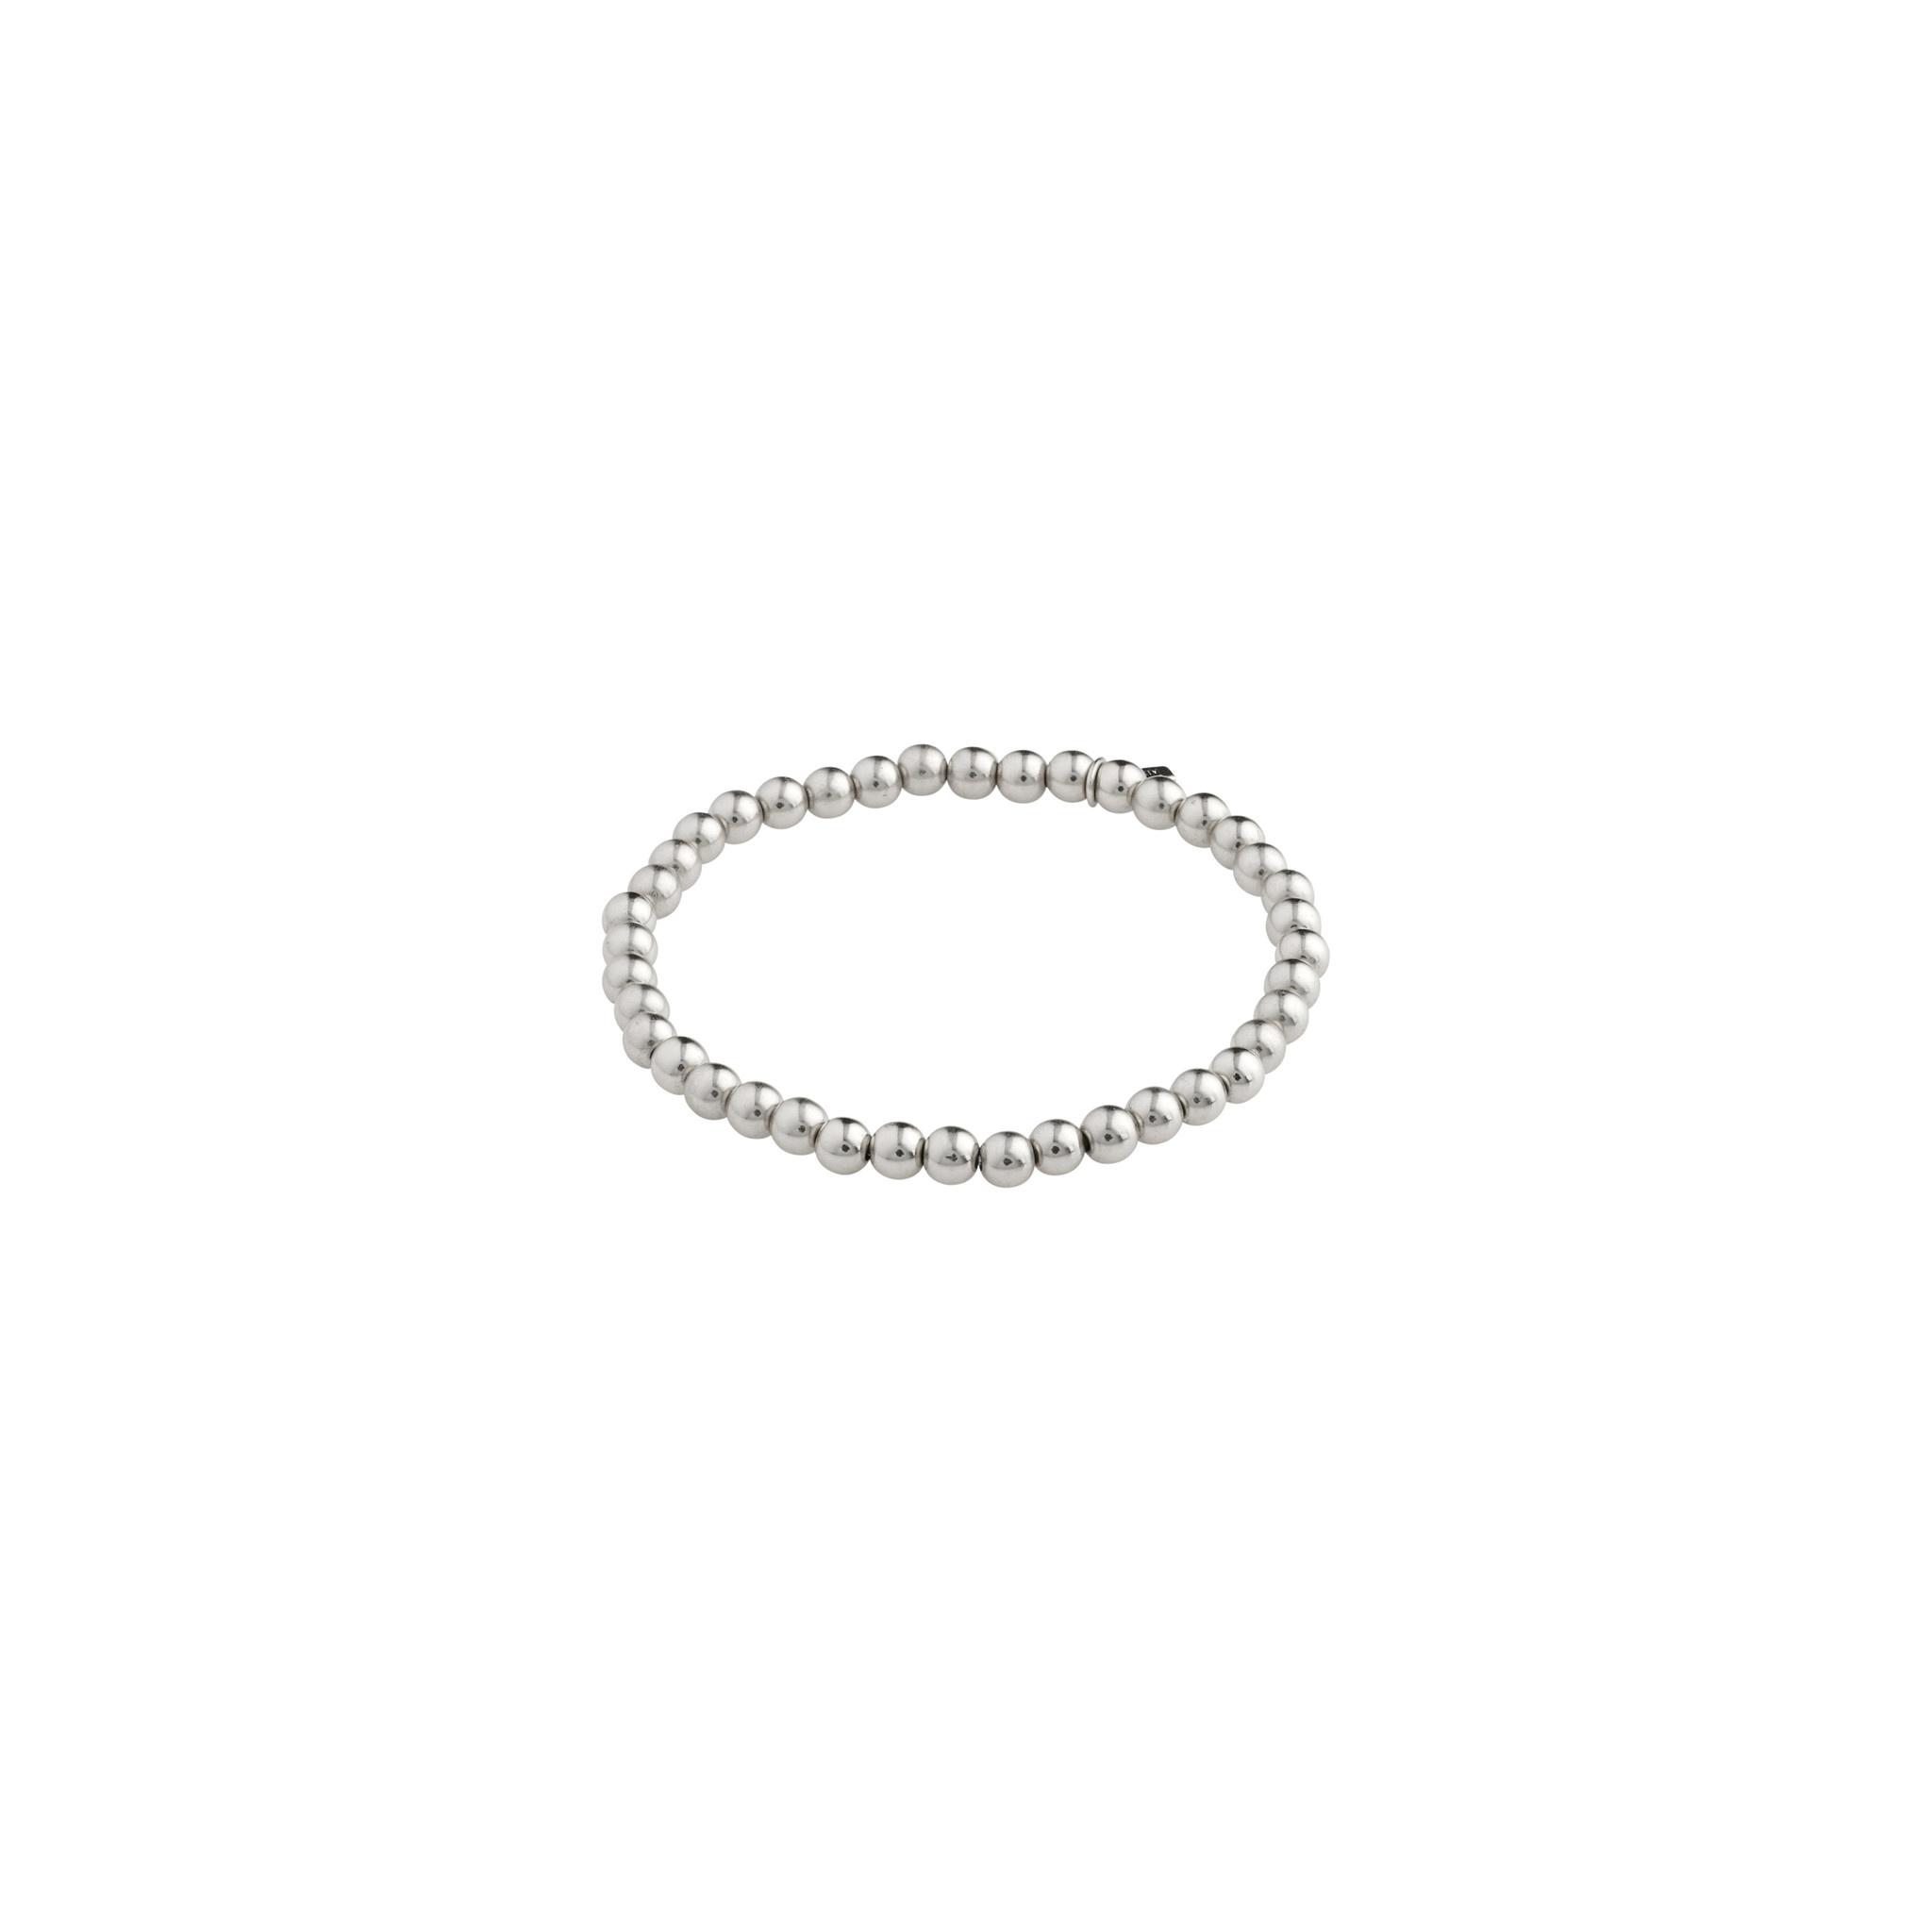 Pilgrim Bracelet Mabelle Silver Plated - 622036002